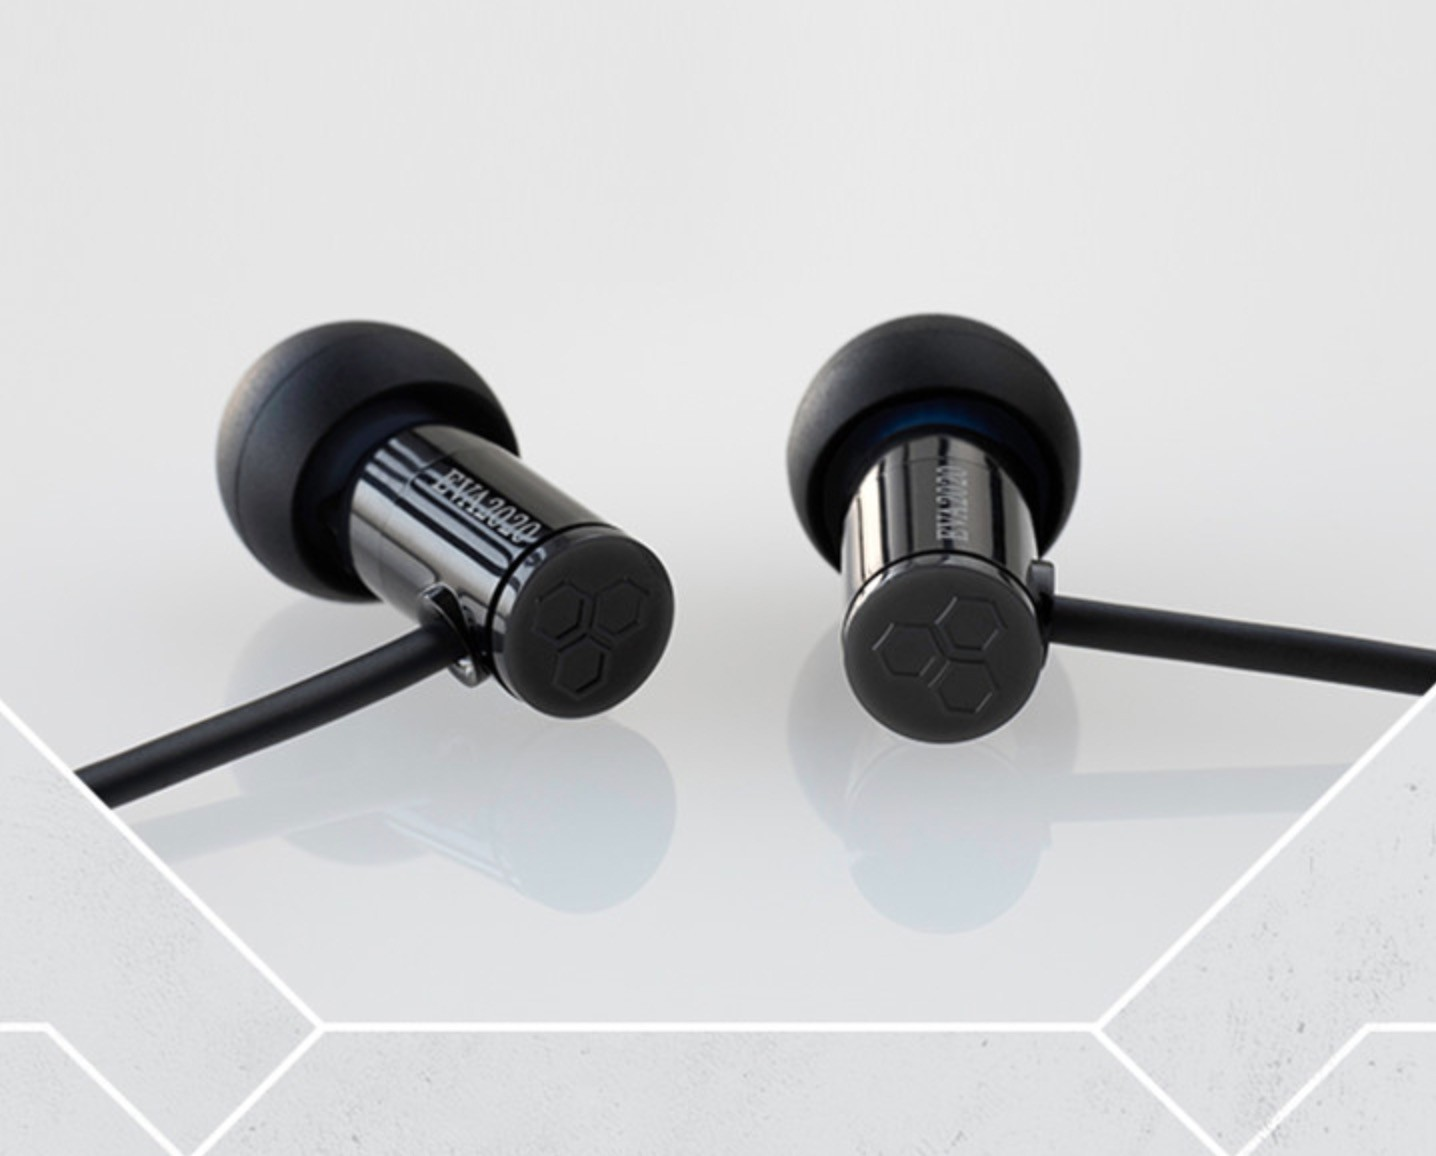 EVA2020 × final 合作款 有线耳机